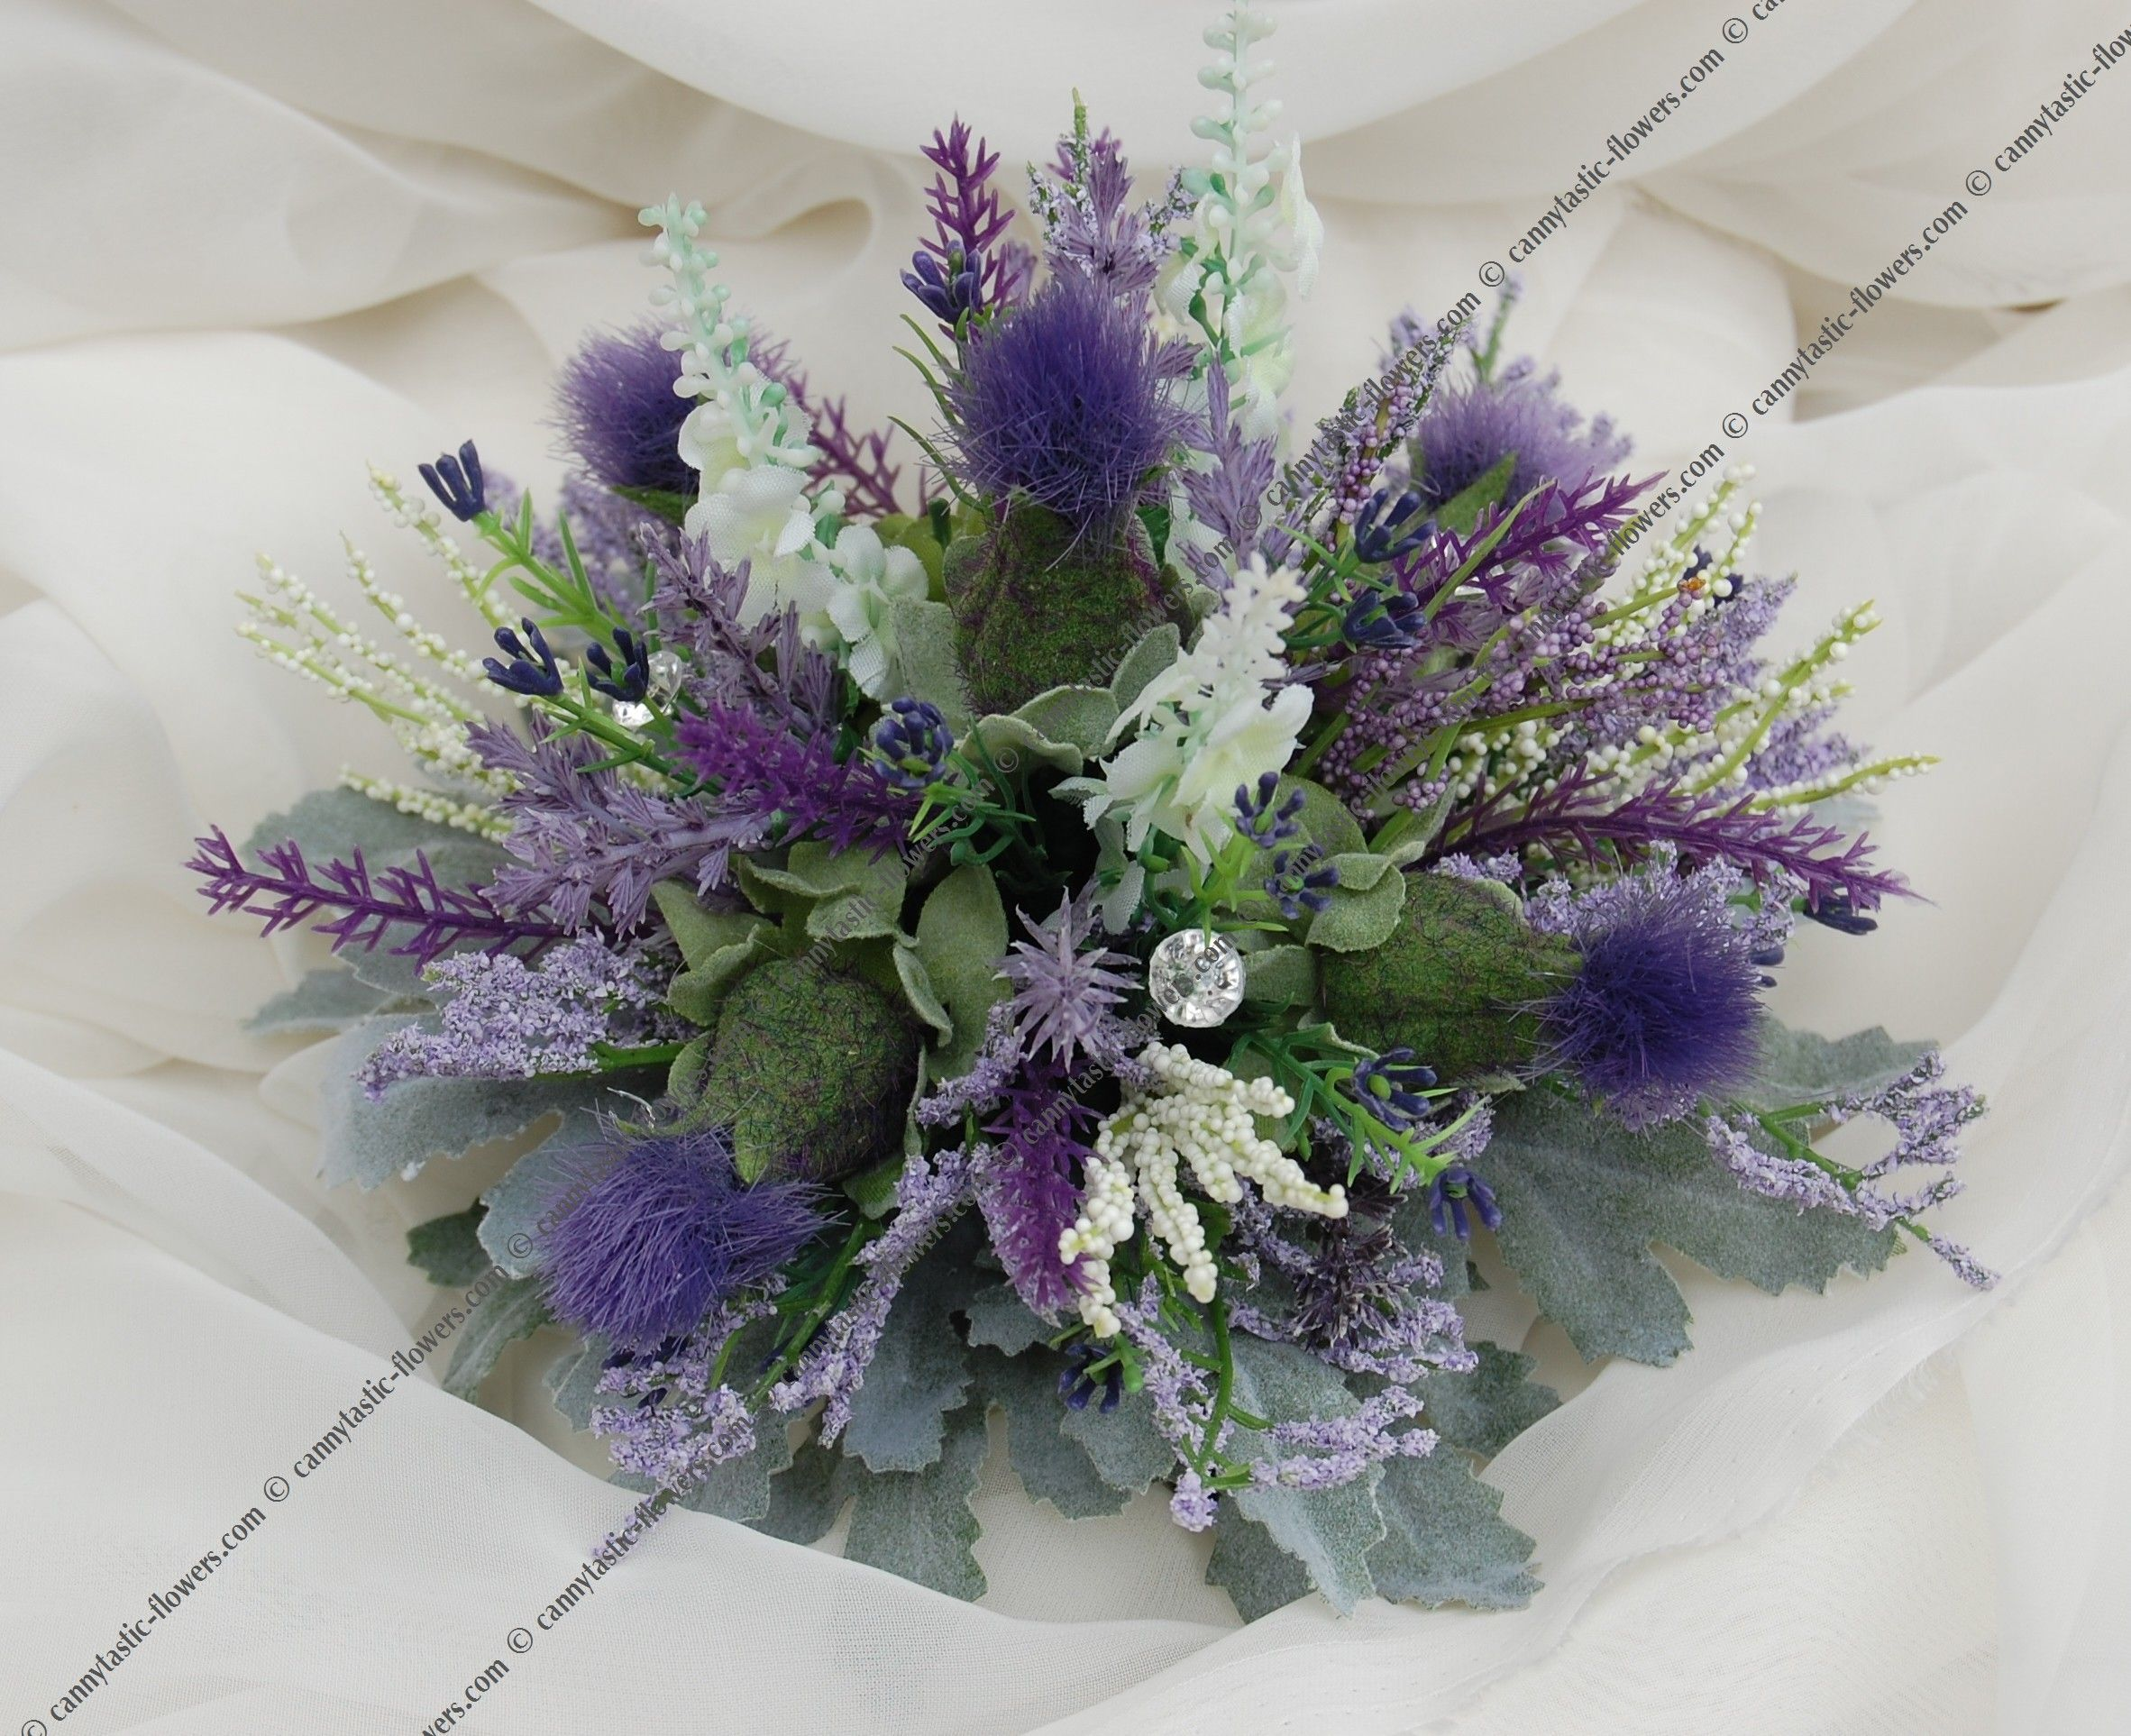 Scottish Thistle Flower Arrangements I4 Jpg 2 364 1 926 Pixels